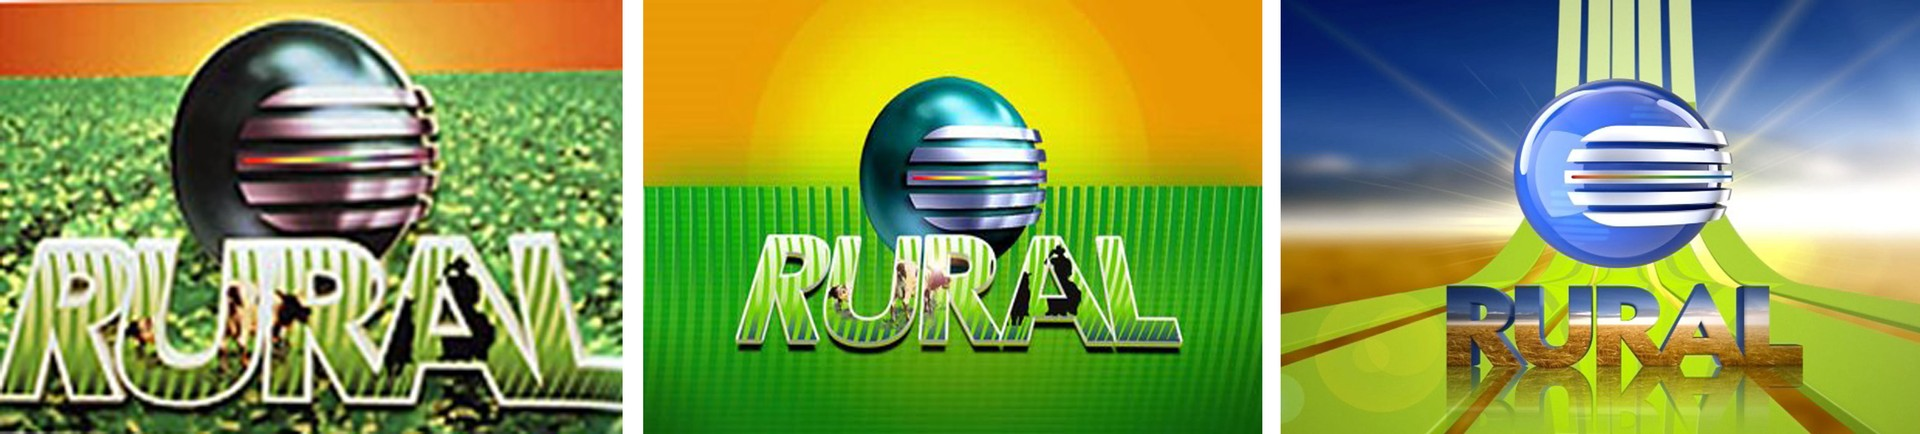 marcas clube rural (Foto: divulgacão)